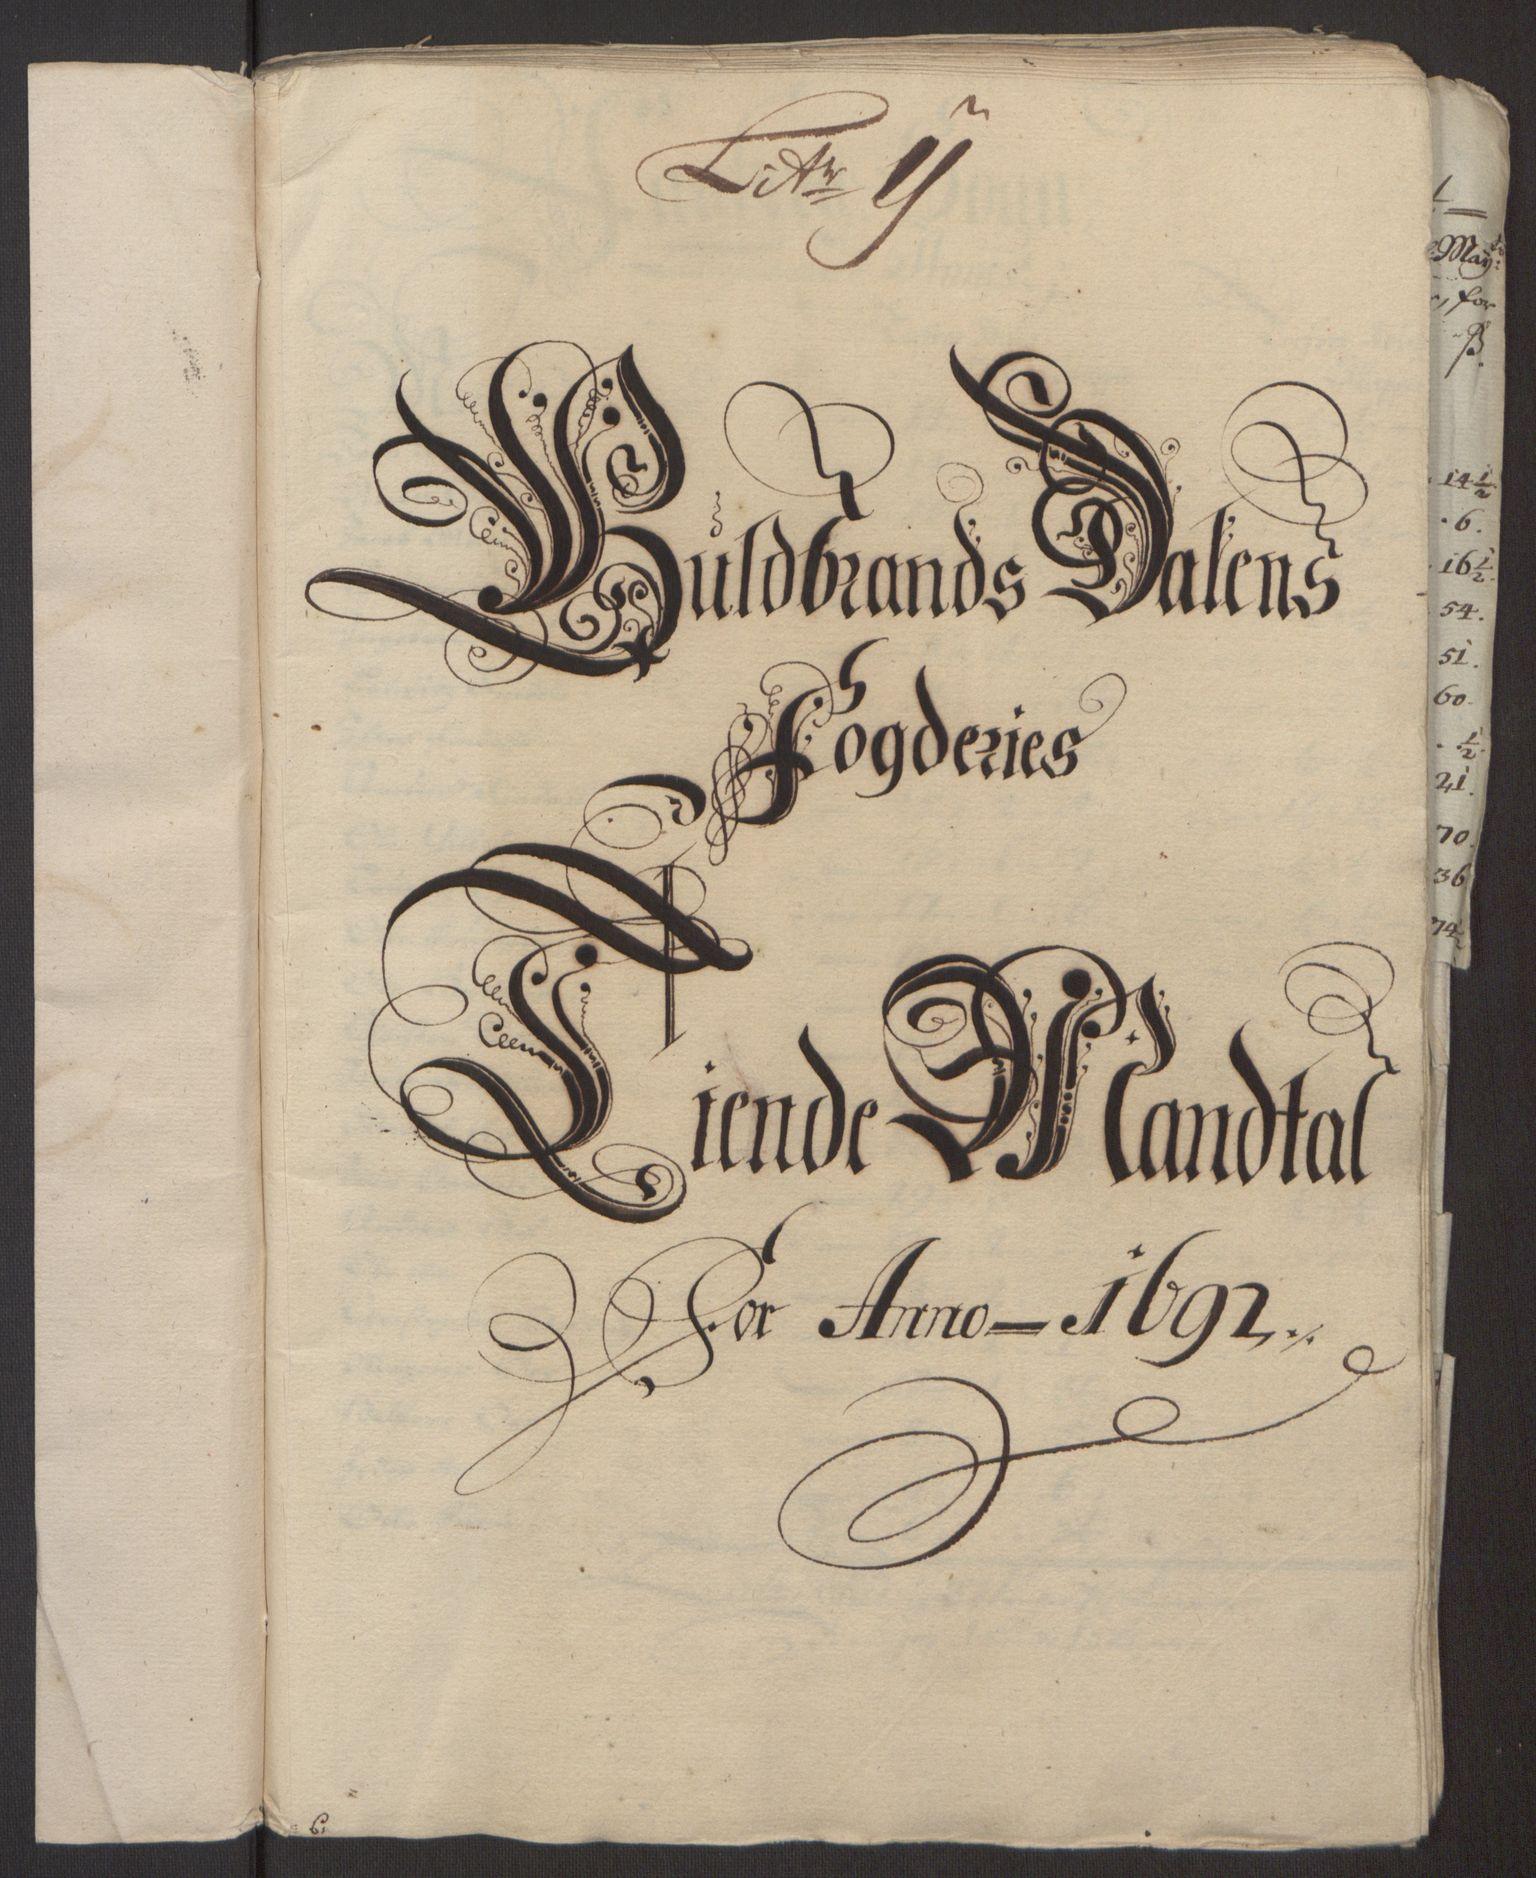 RA, Rentekammeret inntil 1814, Reviderte regnskaper, Fogderegnskap, R17/L1166: Fogderegnskap Gudbrandsdal, 1690-1692, s. 11